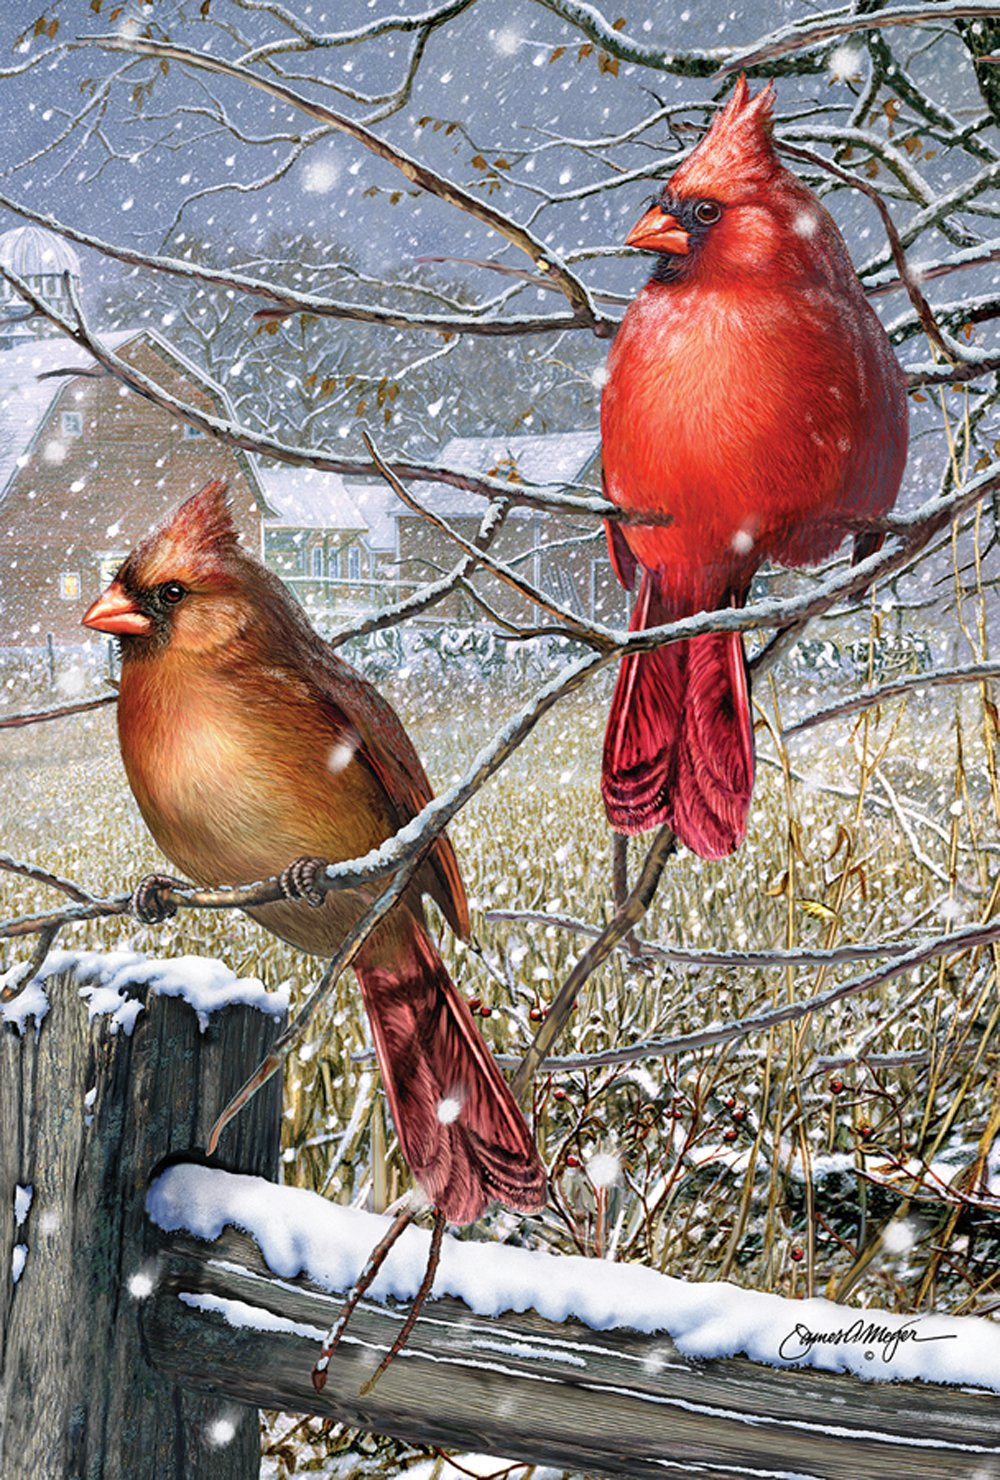 Toland Home Garden Blizzard Buddies 28 x 40 Inch Decorative Winter Cardinal Bird House Flag